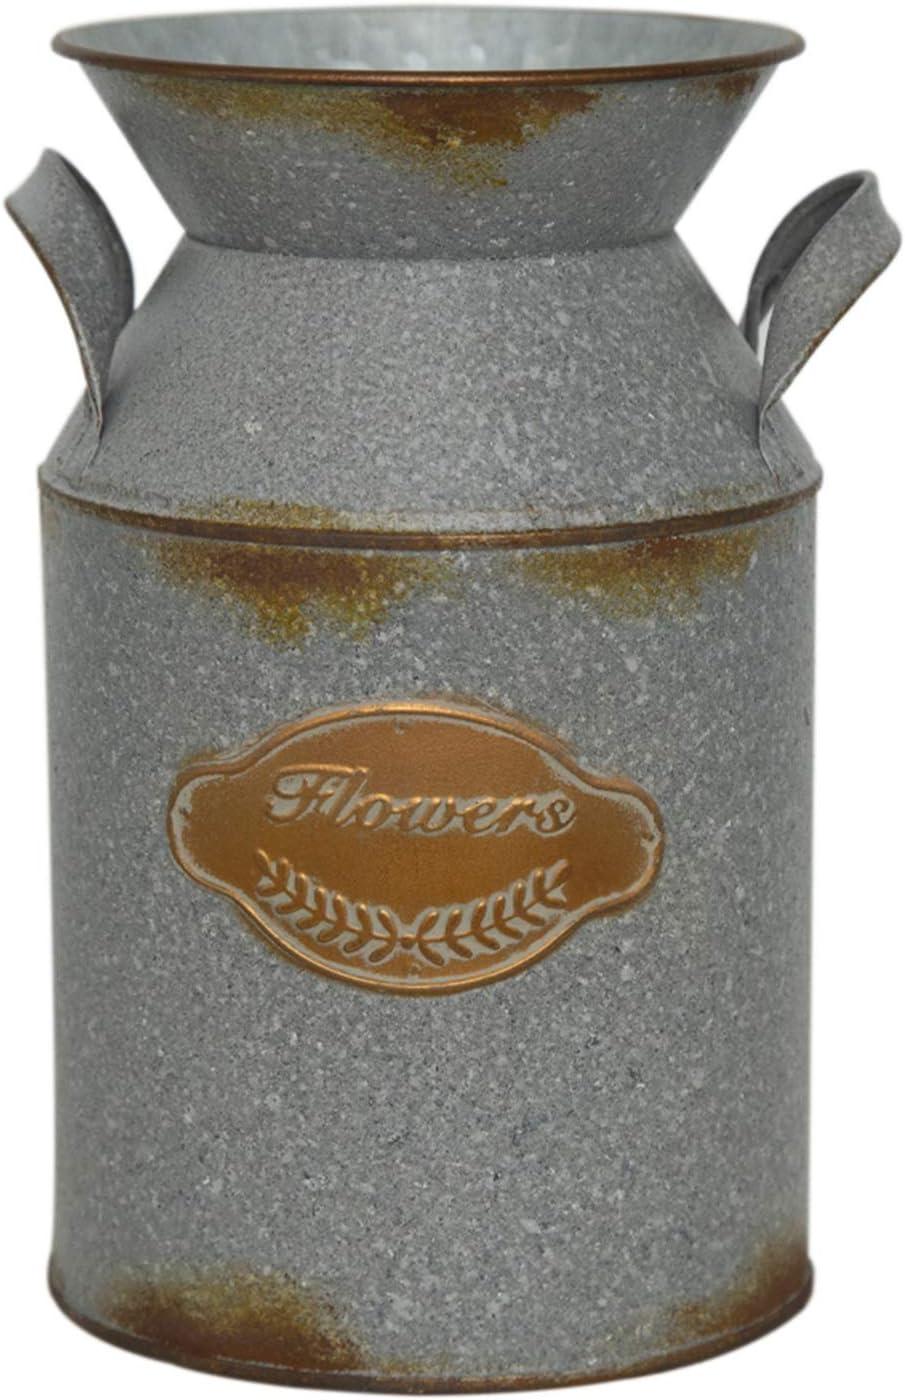 "Putuo Decor Shabby Chic Flower Vase, Galvanized Milk Can, Primitive Country Farmhouse Home Decor, 5"" W, 8.3"" H"